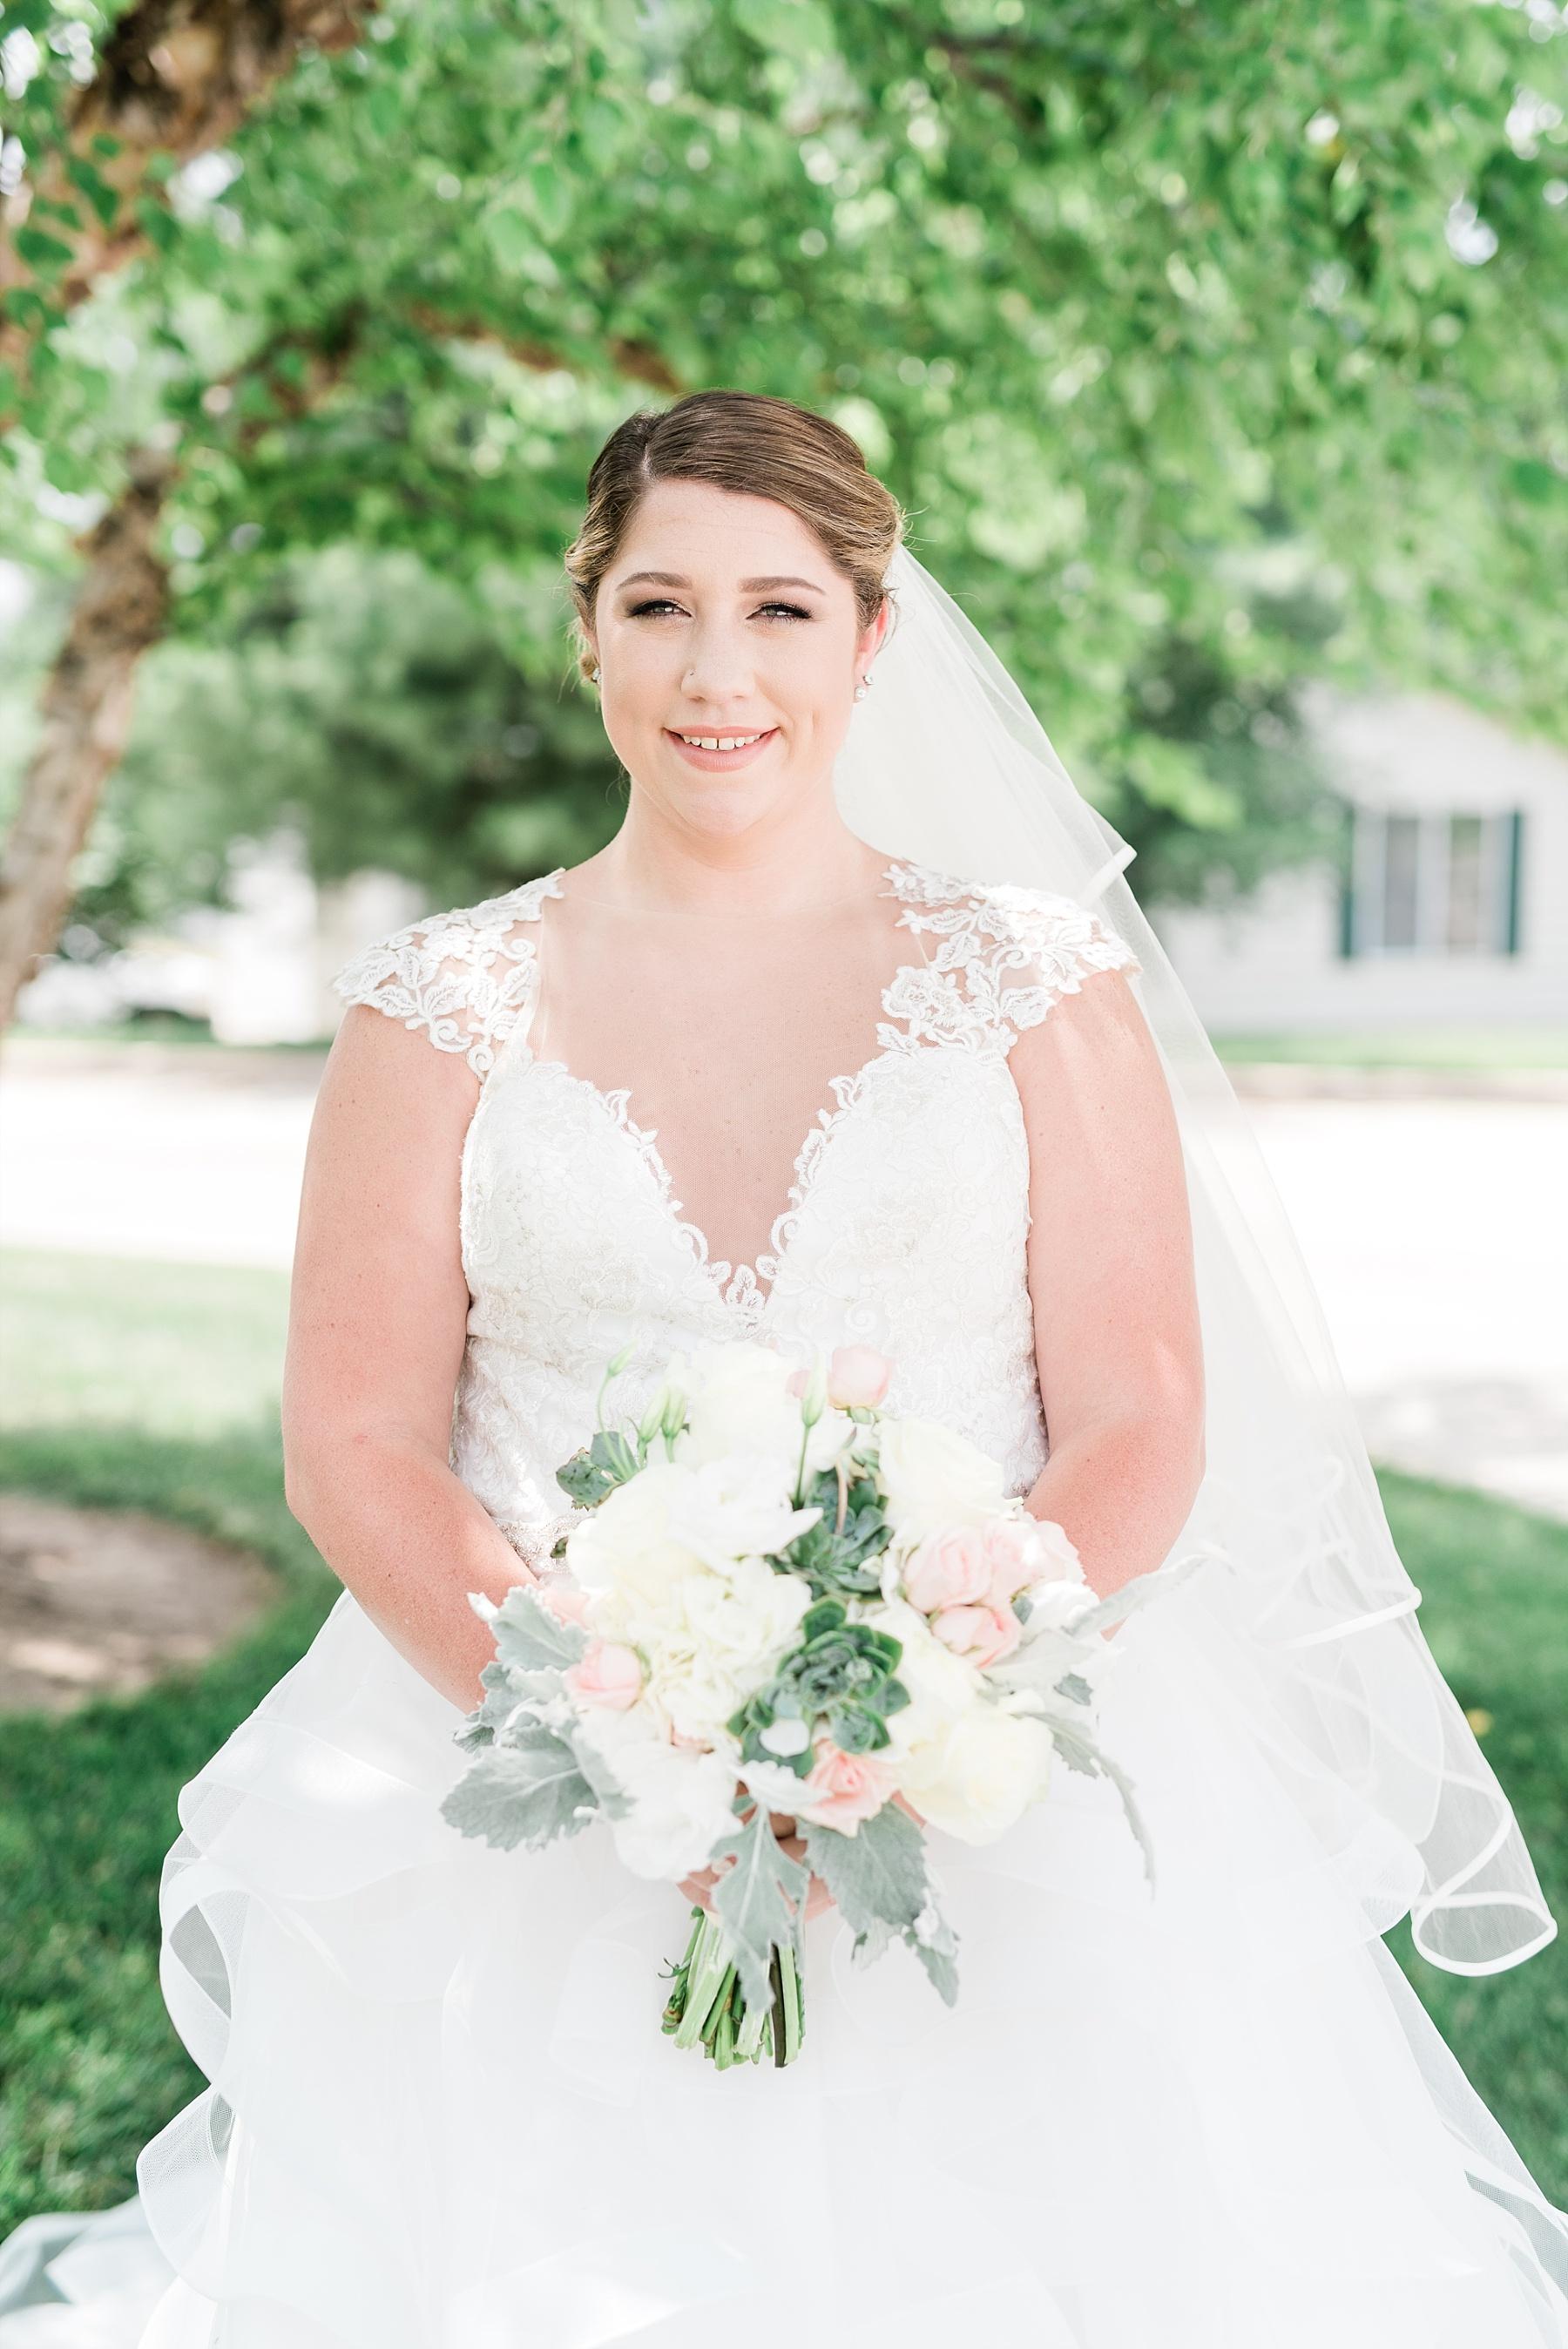 Baurichter Wedding at Stoney Creek Inn Columbia Missouri by Kelsi Kliethermes Photography_0002.jpg